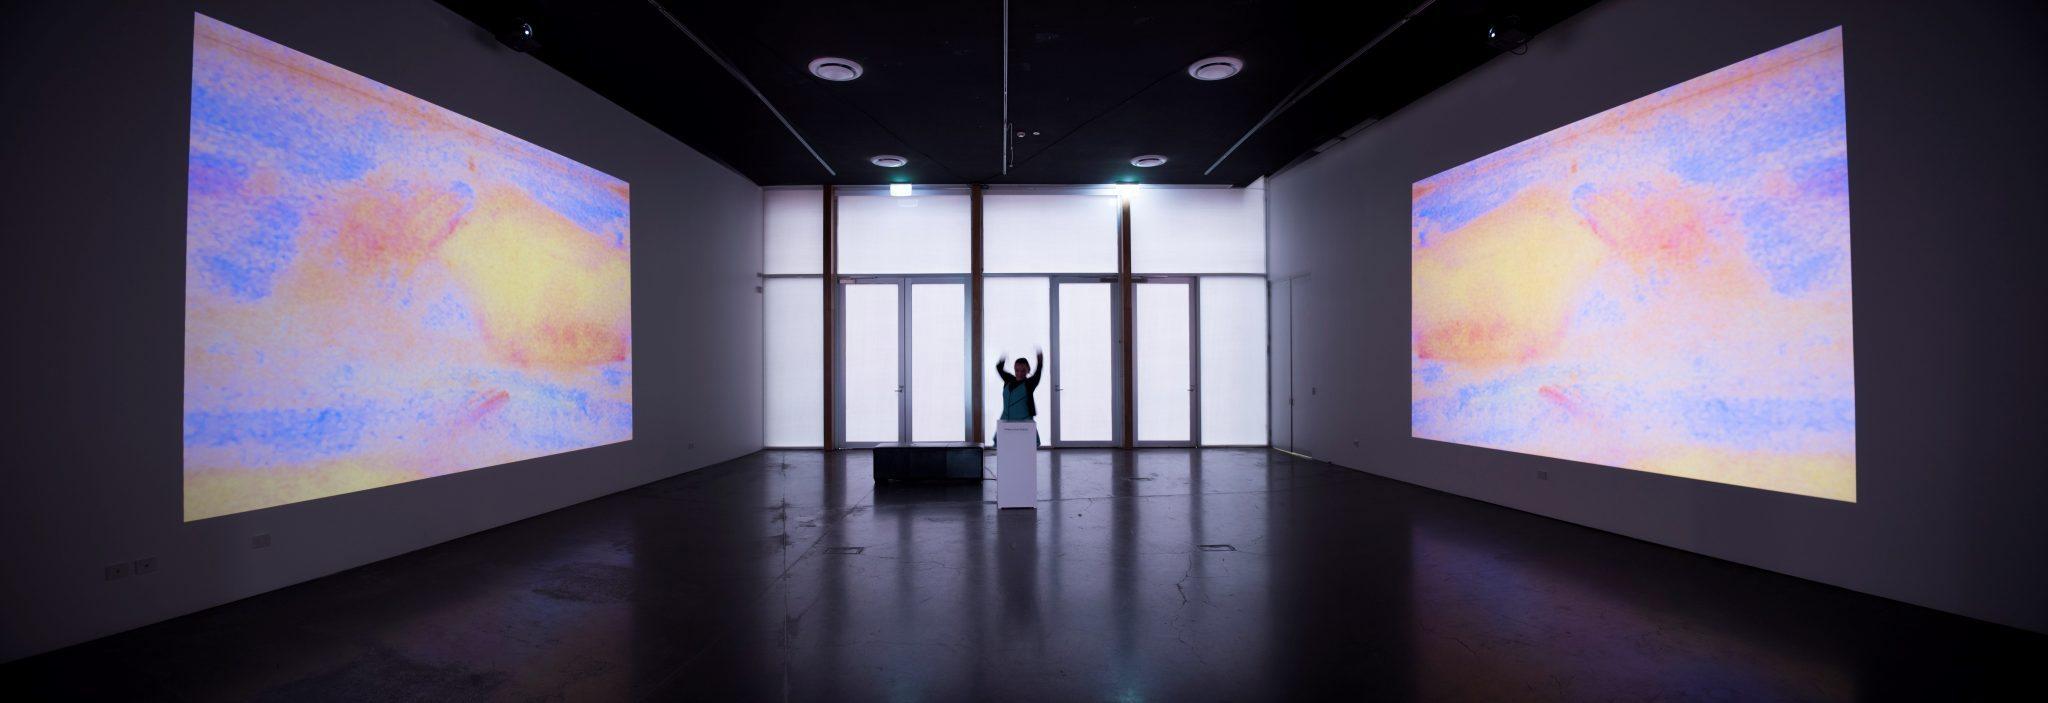 Roger Alsop 'Home' installation image